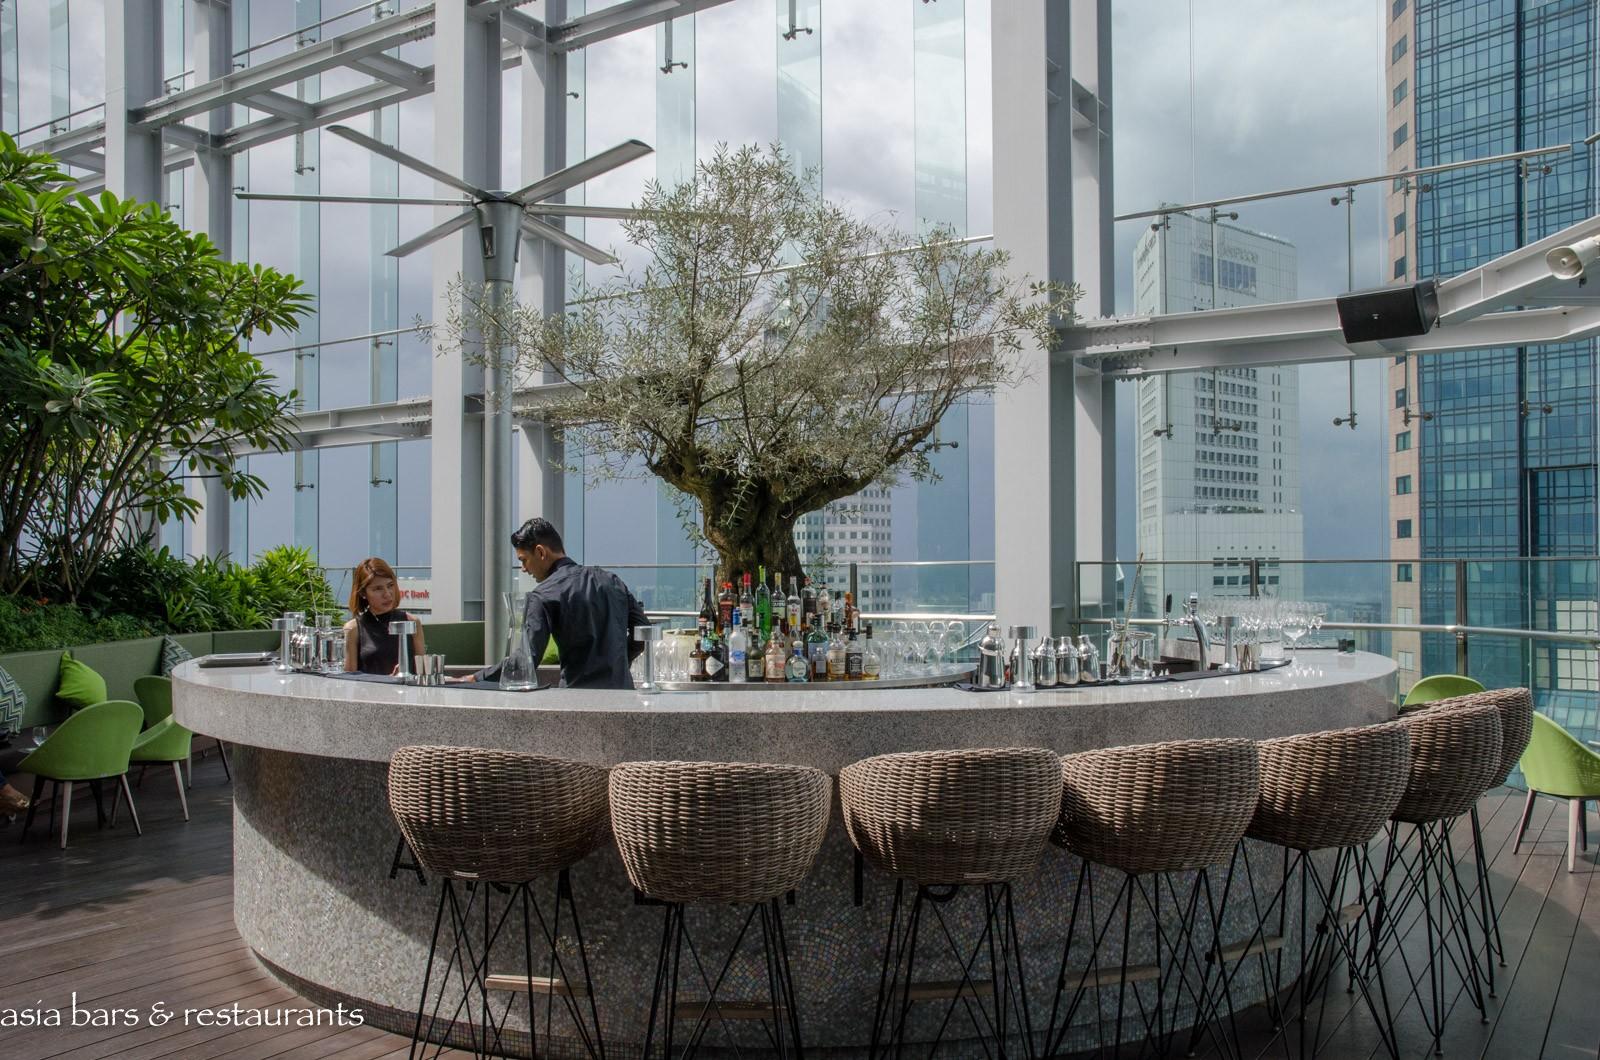 Artemis grill rooftop mediterranean restaurant bar in singapore asia bars restaurants - Restaurant bar and grill ...